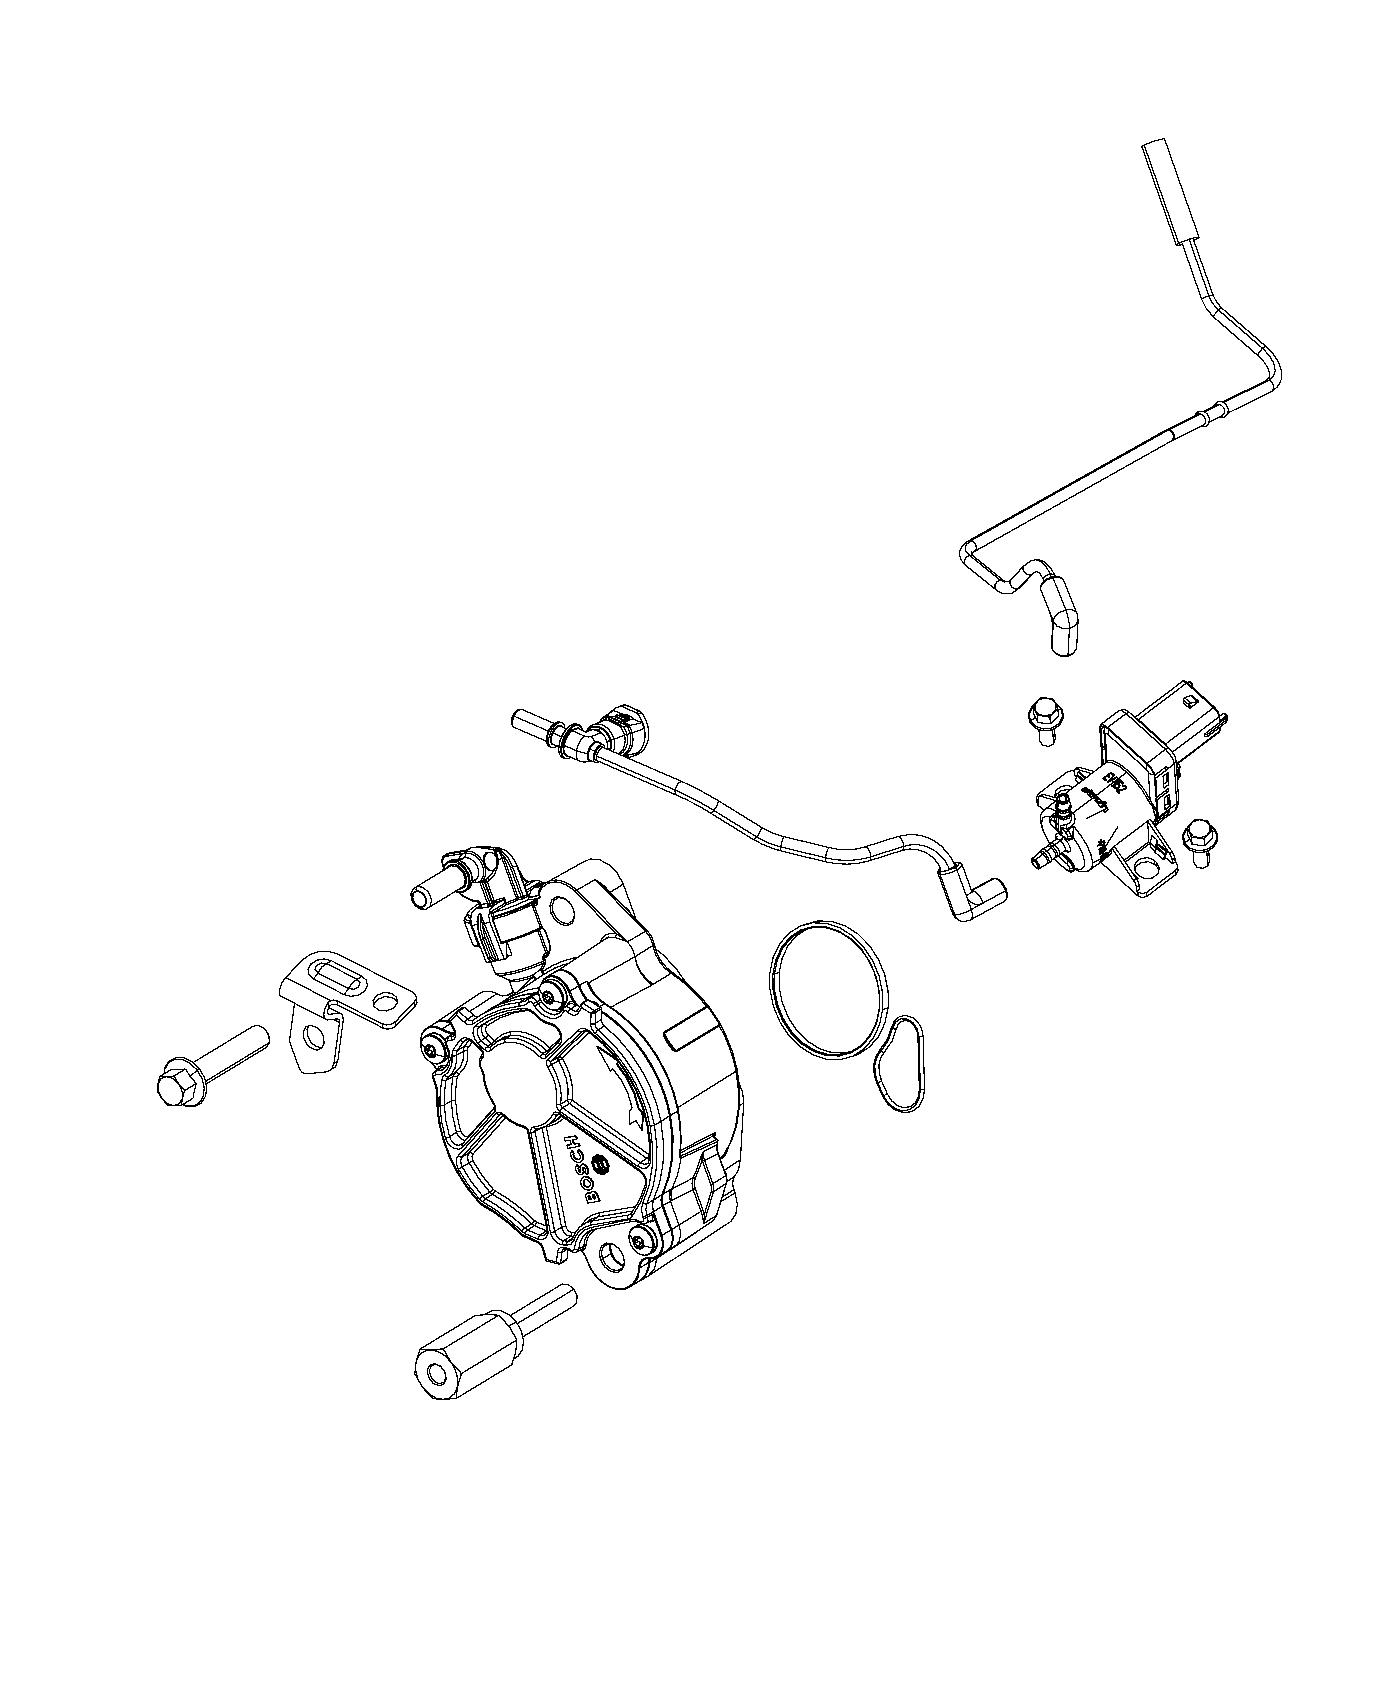 Jeep Grand Cherokee Pump Vacuum Emissions Export